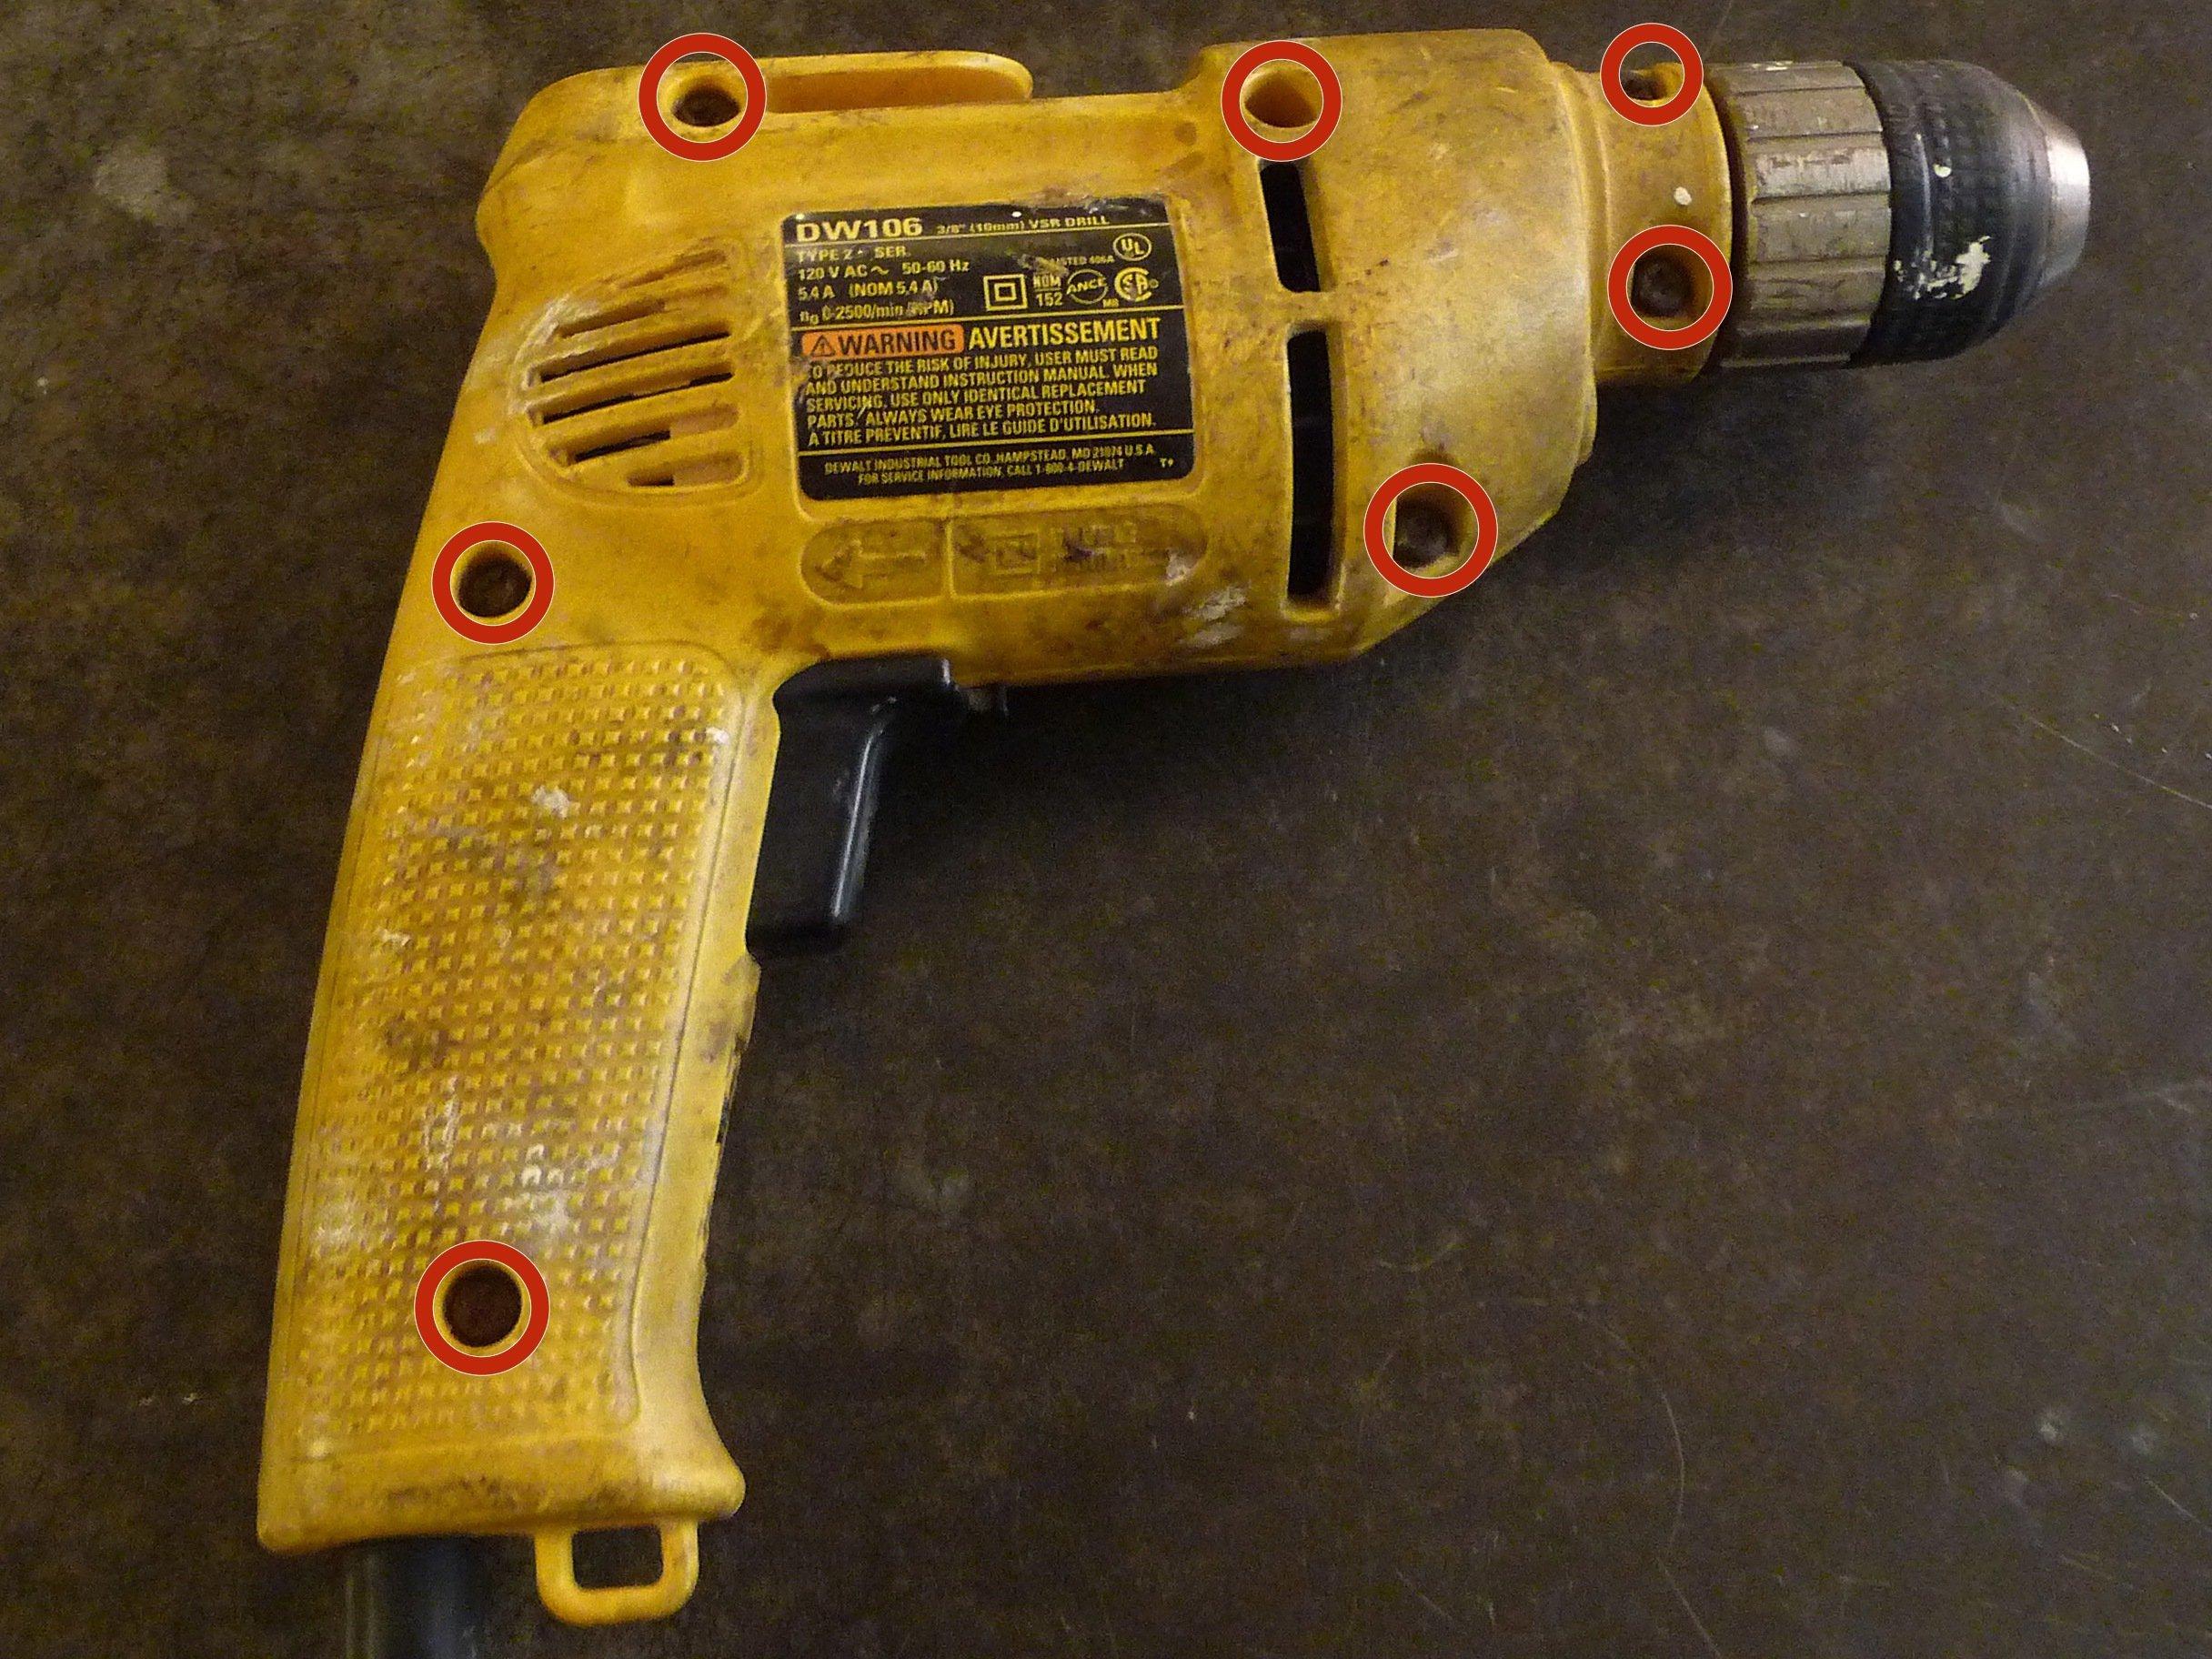 [SCHEMATICS_49CH]  DeWALT DW106 Amp Drill Maintenance - iFixit Repair Guide | De Walt Power Tool Wiring Diagrams |  | iFixit